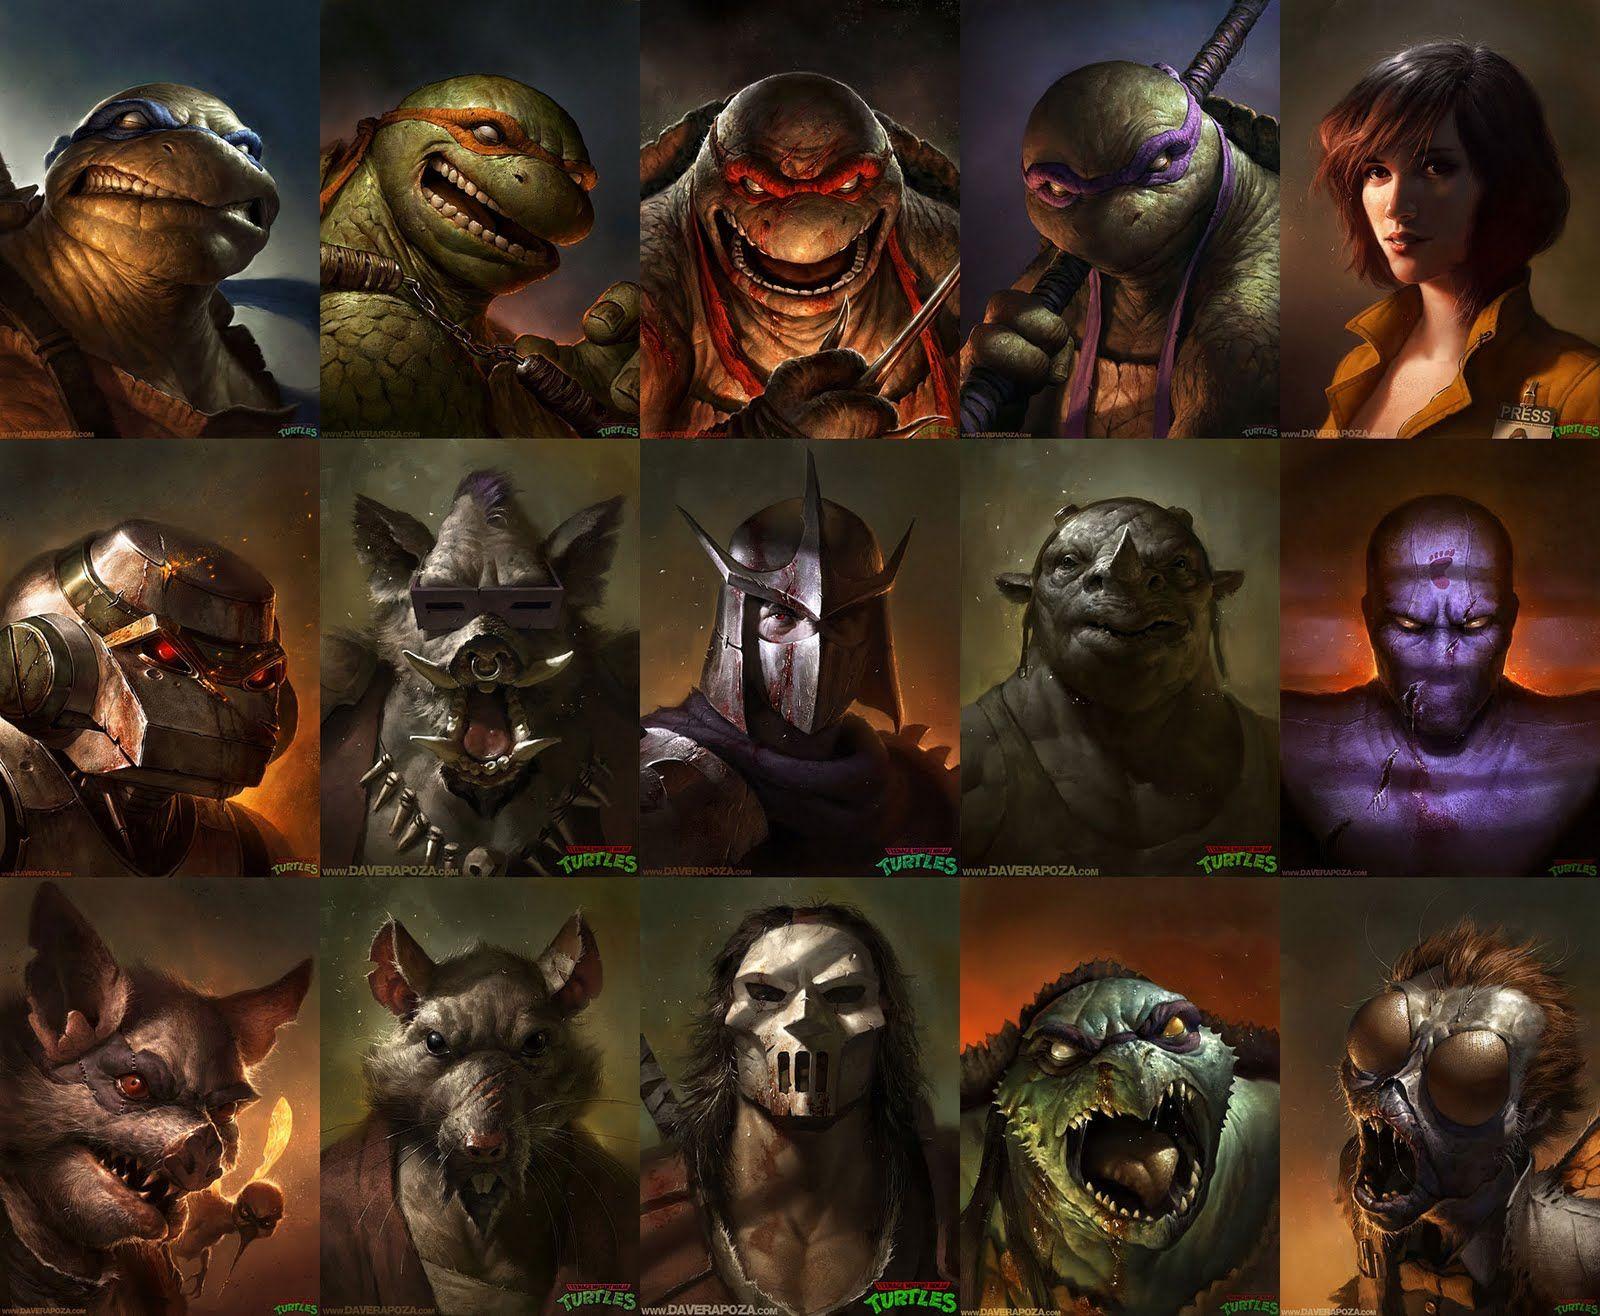 Te Teenage Mutant Ninja Turtles Tv Show - Drawings of the teenage mutant ninja turtles characters by dave rapoza